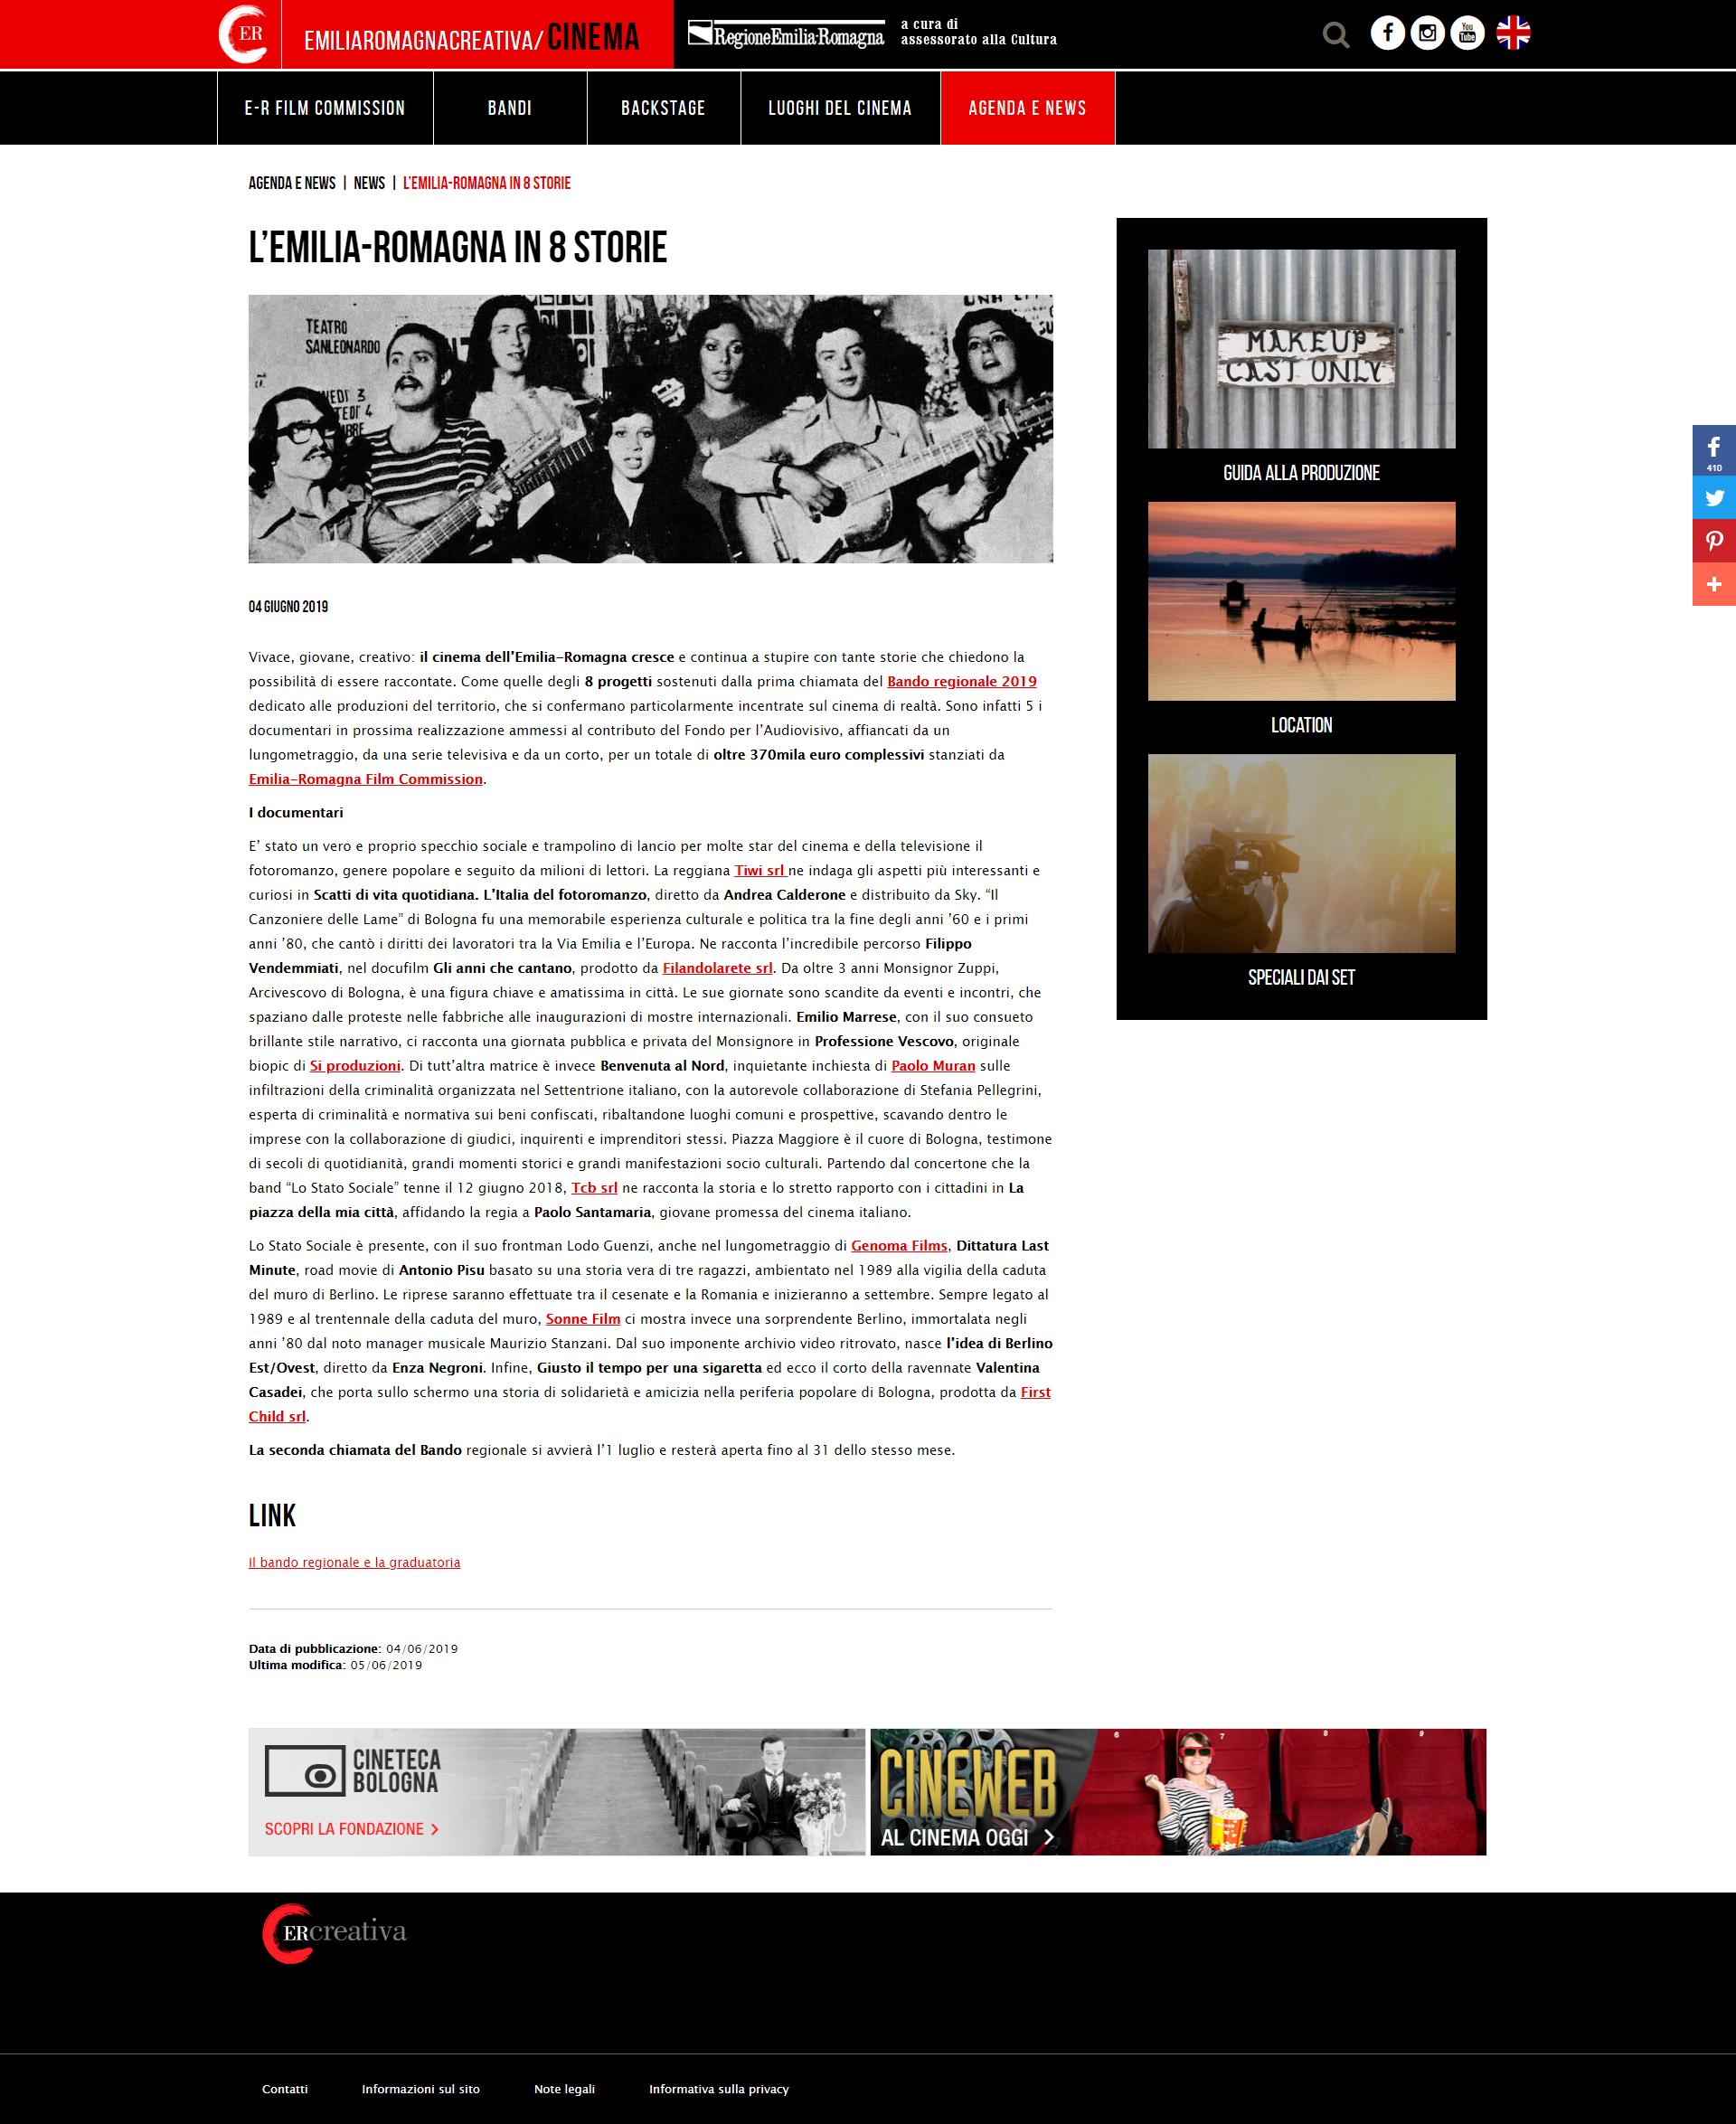 screencapture-cinema-emiliaromagnacreativa-it-it-news-lemilia-romagna-8-storie-2019-06-09-12_18_15